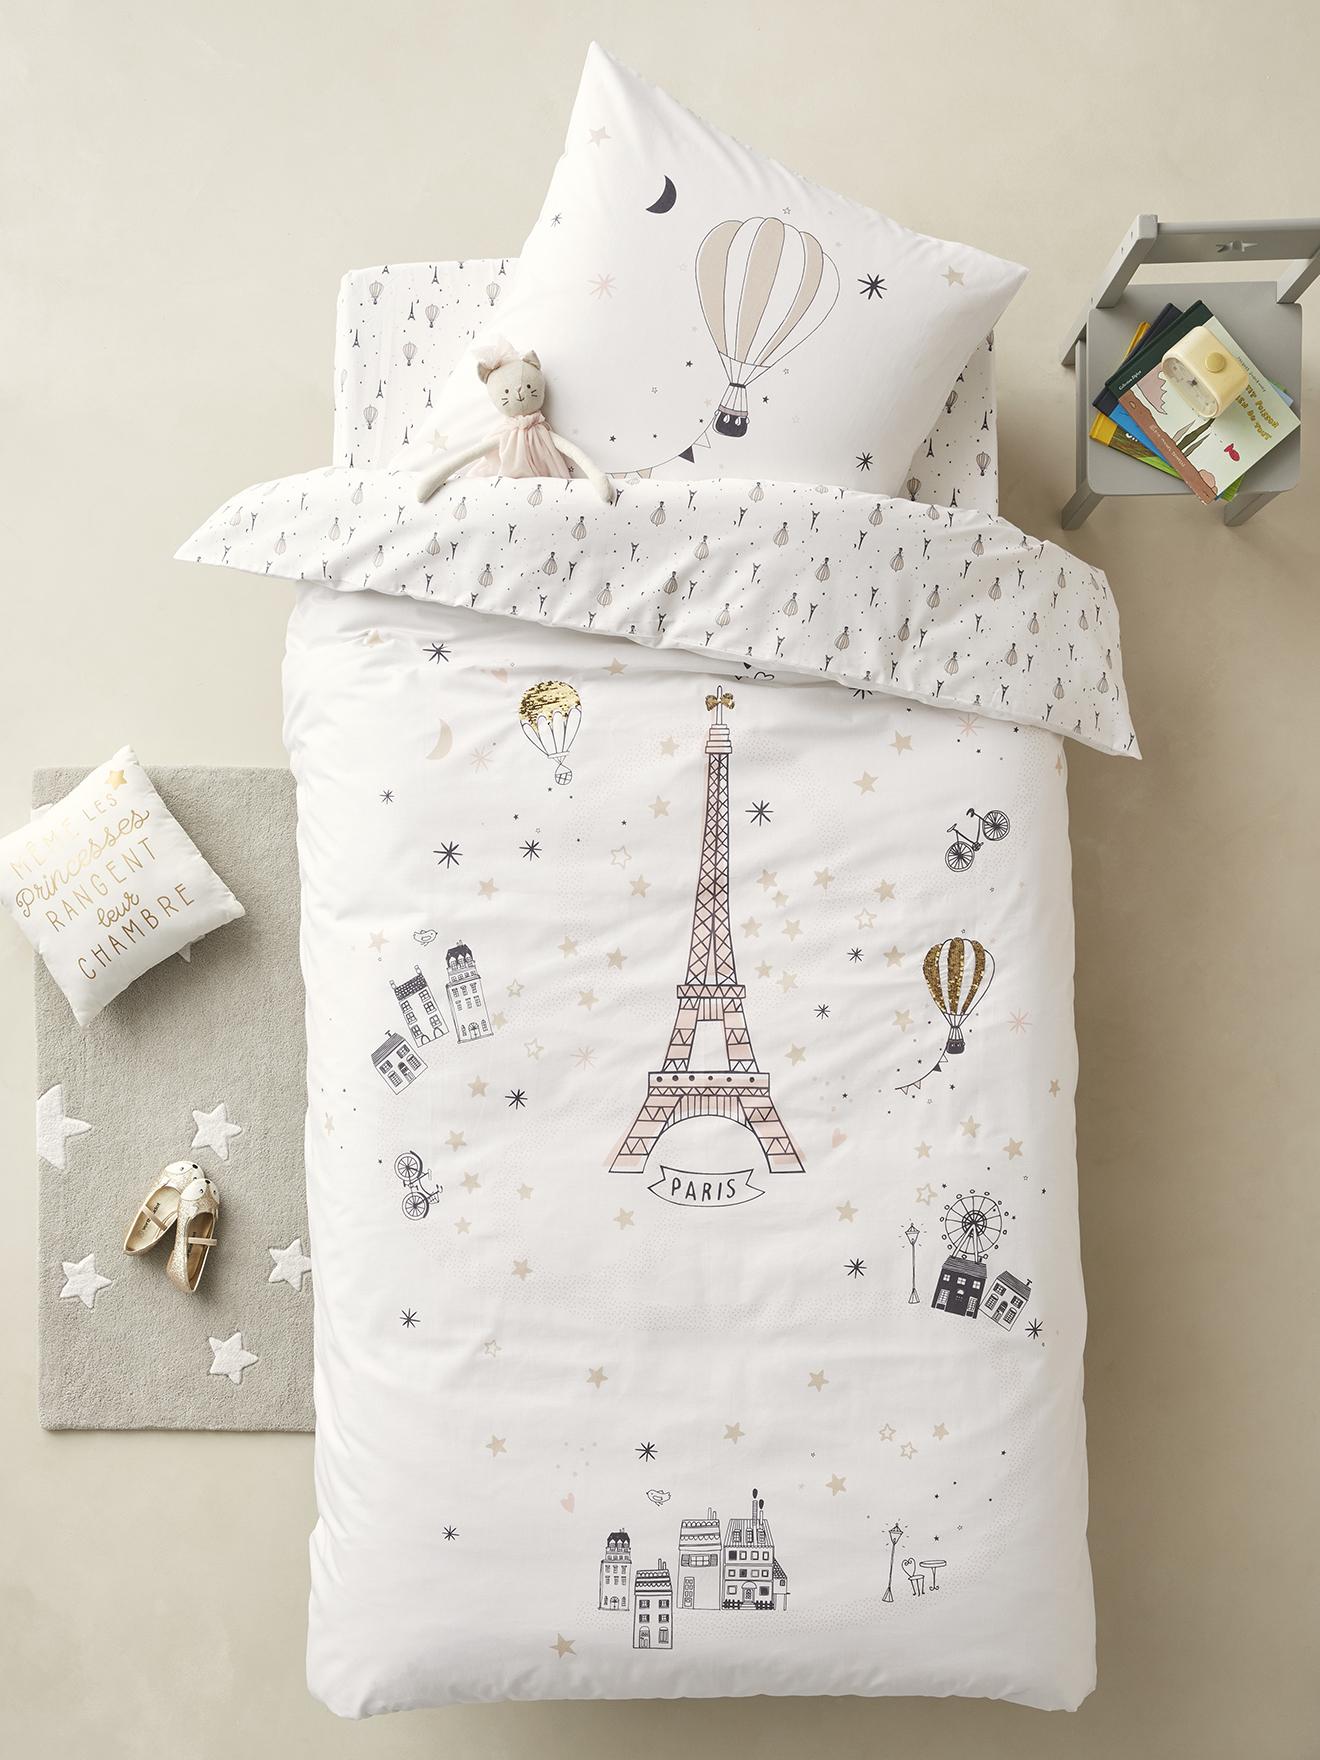 delicate decorative labels.htm duvet cover pillowcase set  paris feerie white light solid with  paris feerie white light